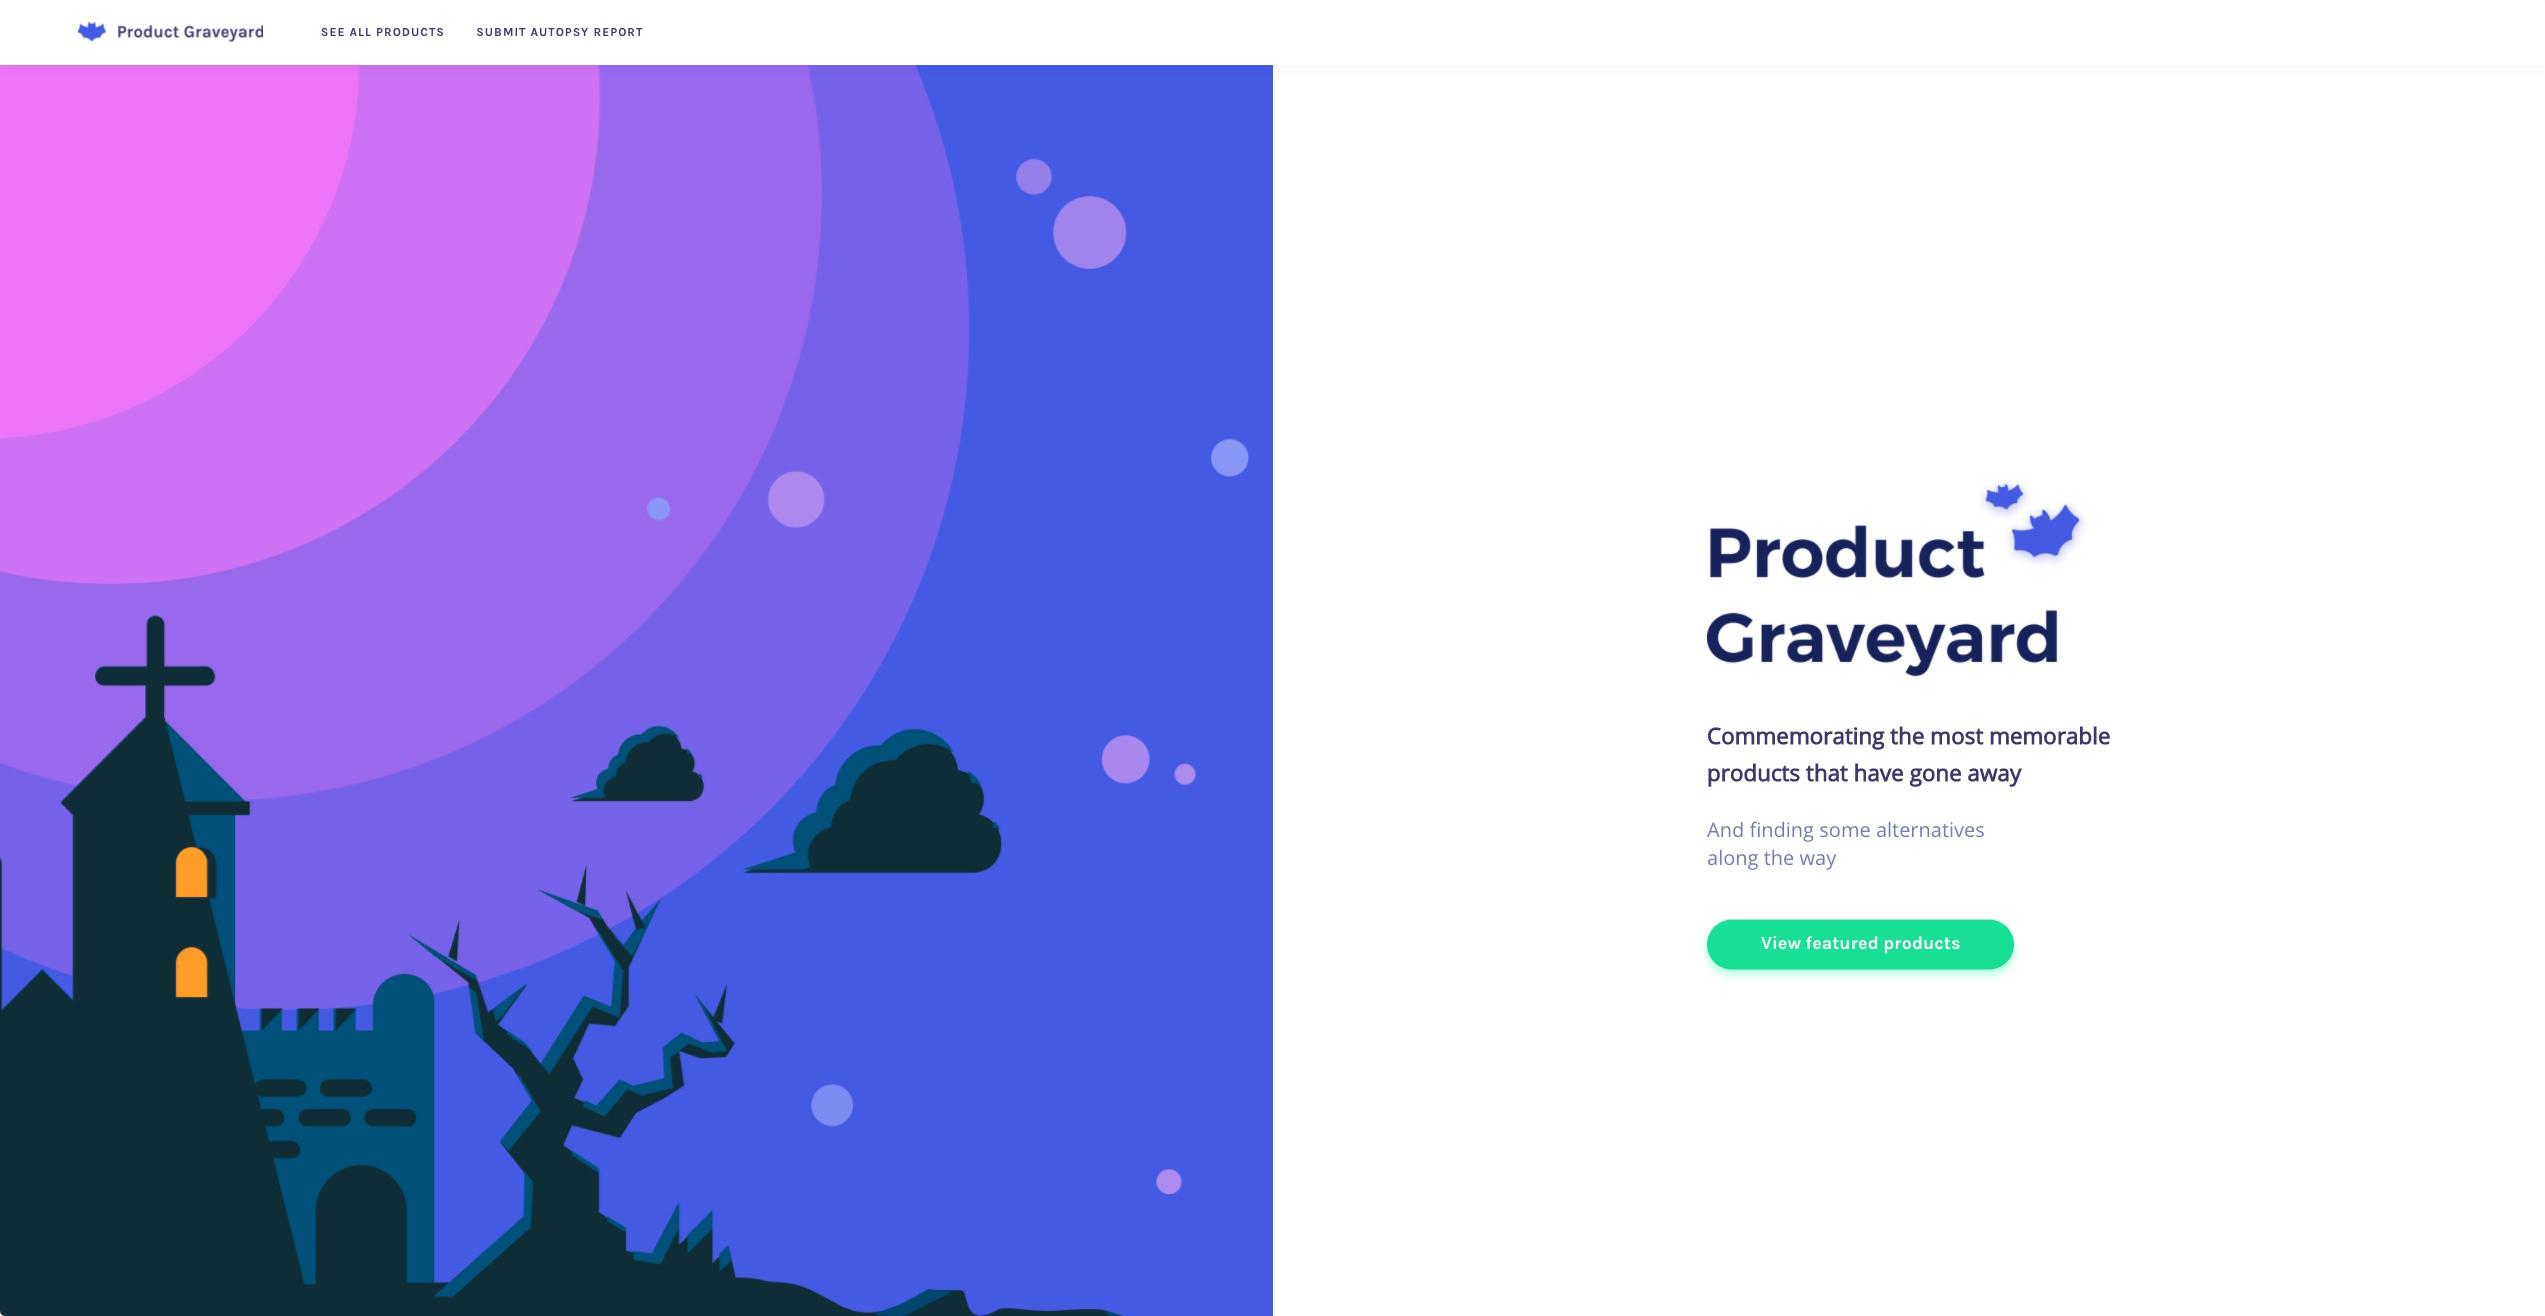 Product Graveyard